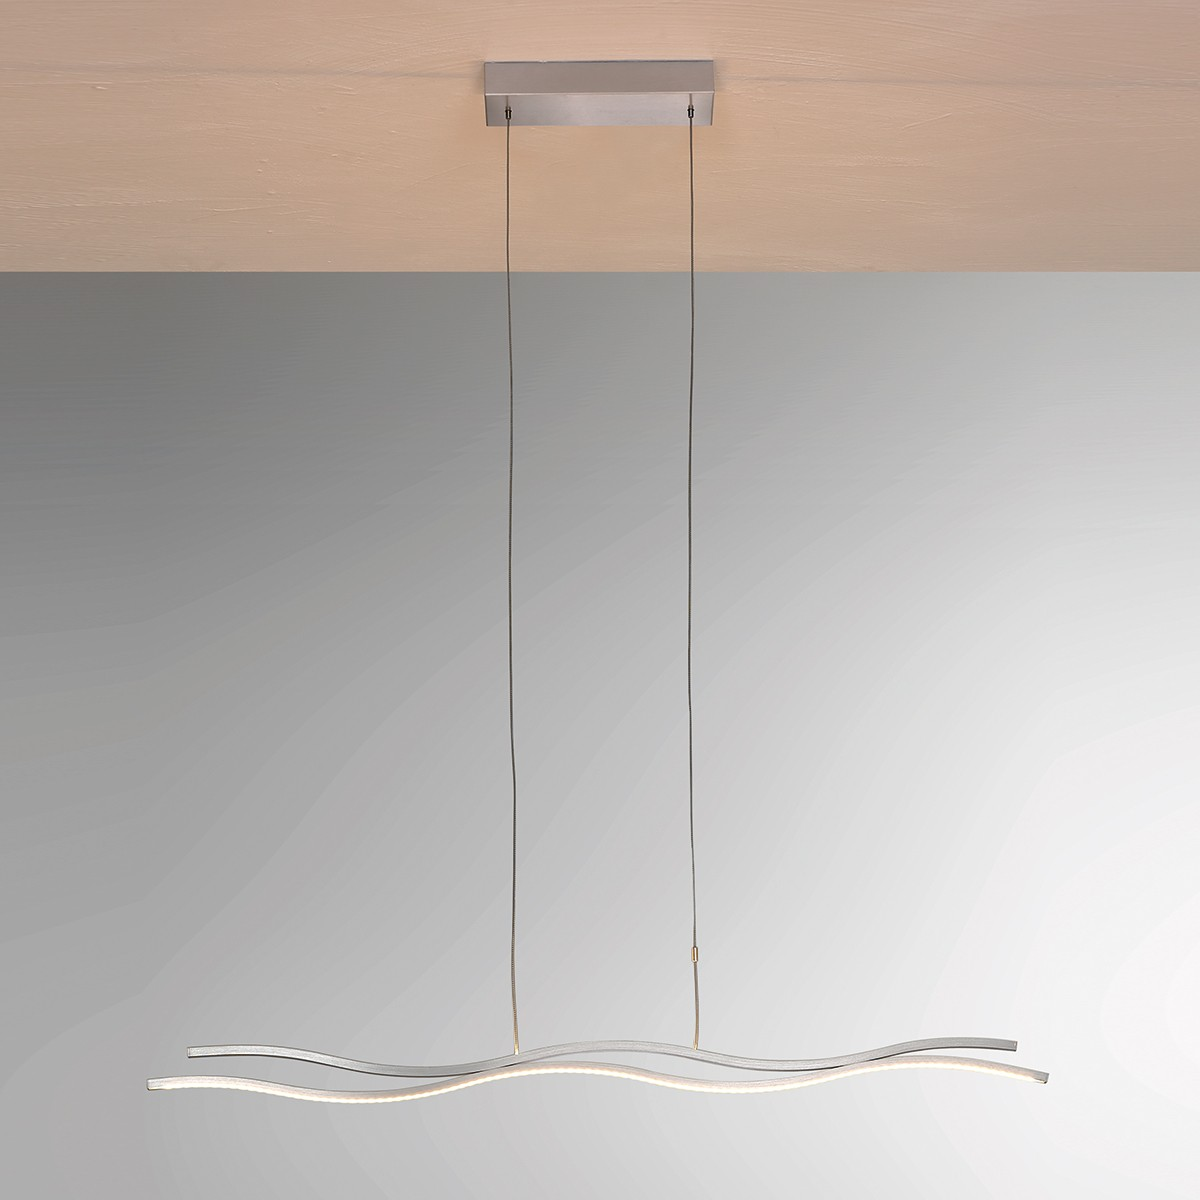 Bopp Soft Pendelleuchte, Aluminium geschliffen, mit Berührungssensor, Länge: 100 cm